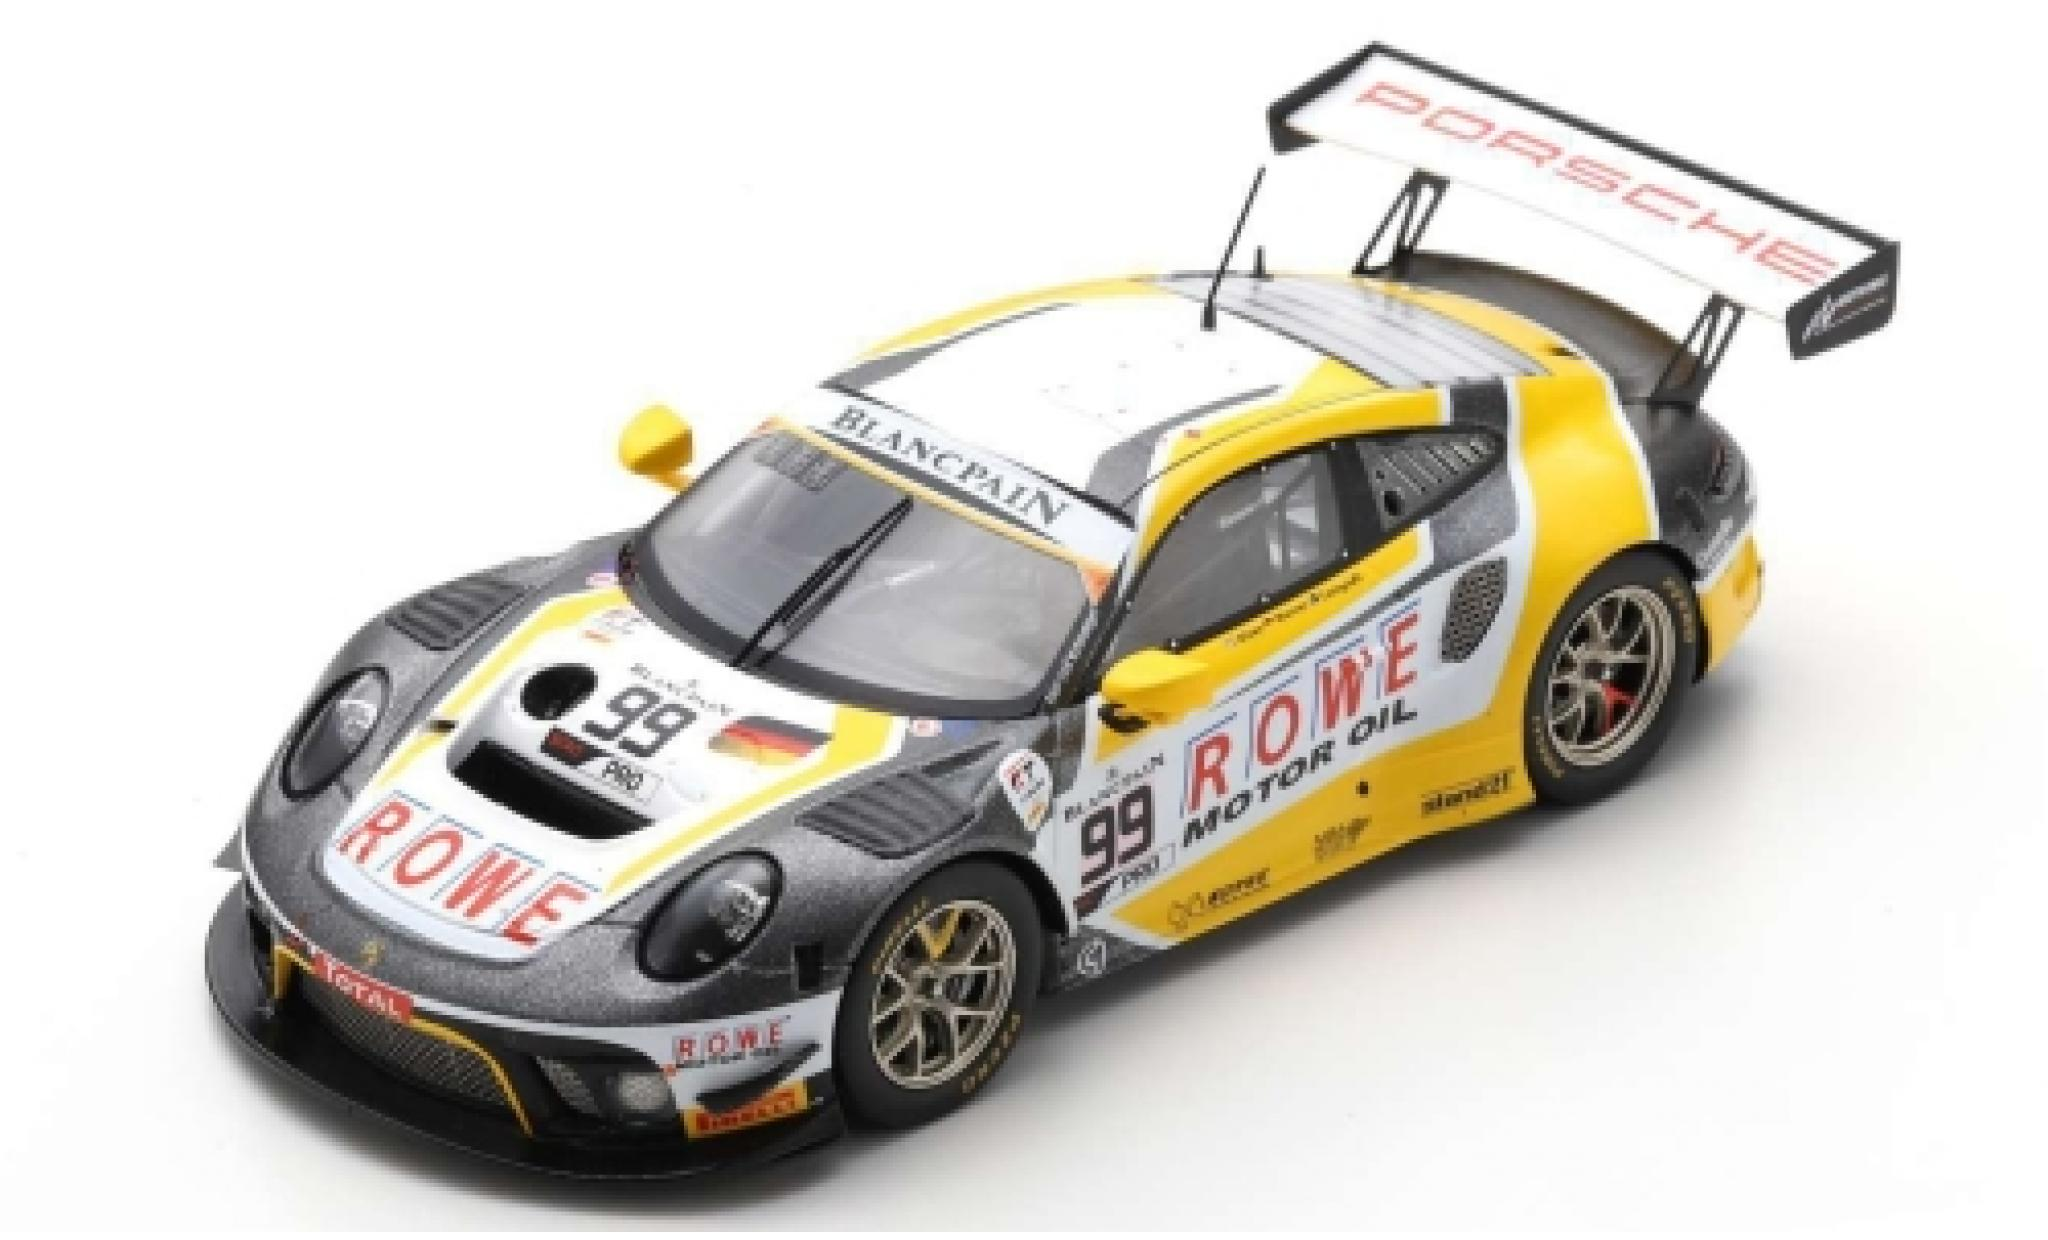 Porsche 992 GT3 R 1/43 Spark 911 (991) No.99 ROWE Racing 24h Spa 2019 D.Olsen/M.Campbell/D.Werner